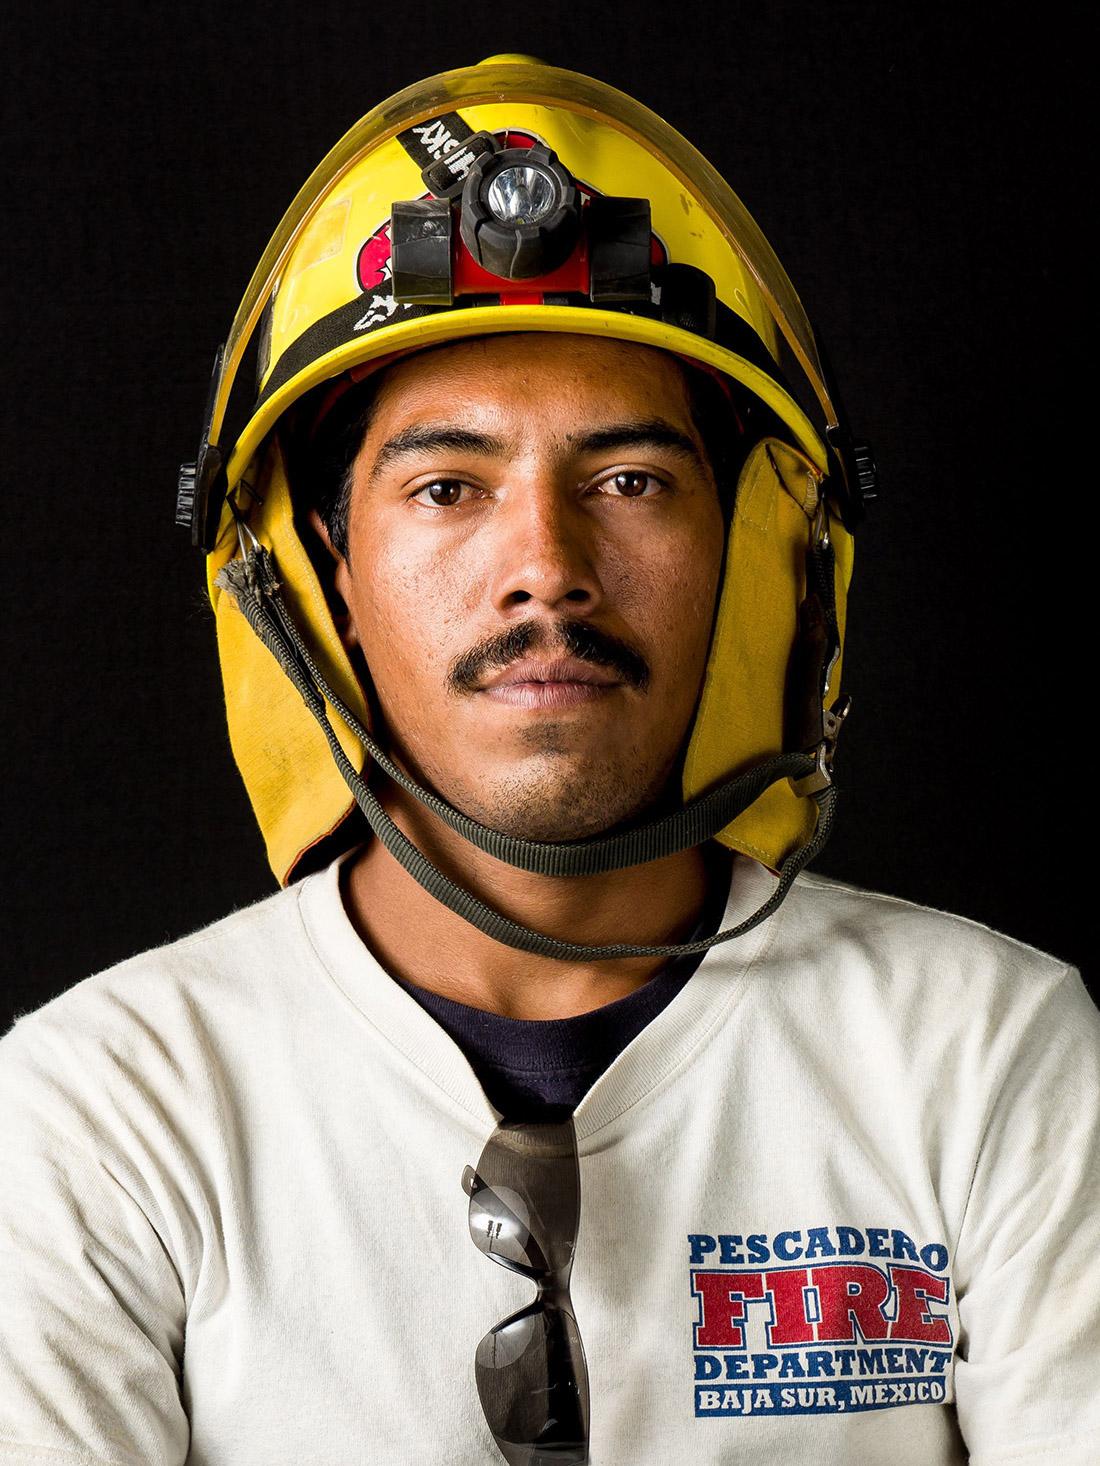 Sgt. Luis Aviles